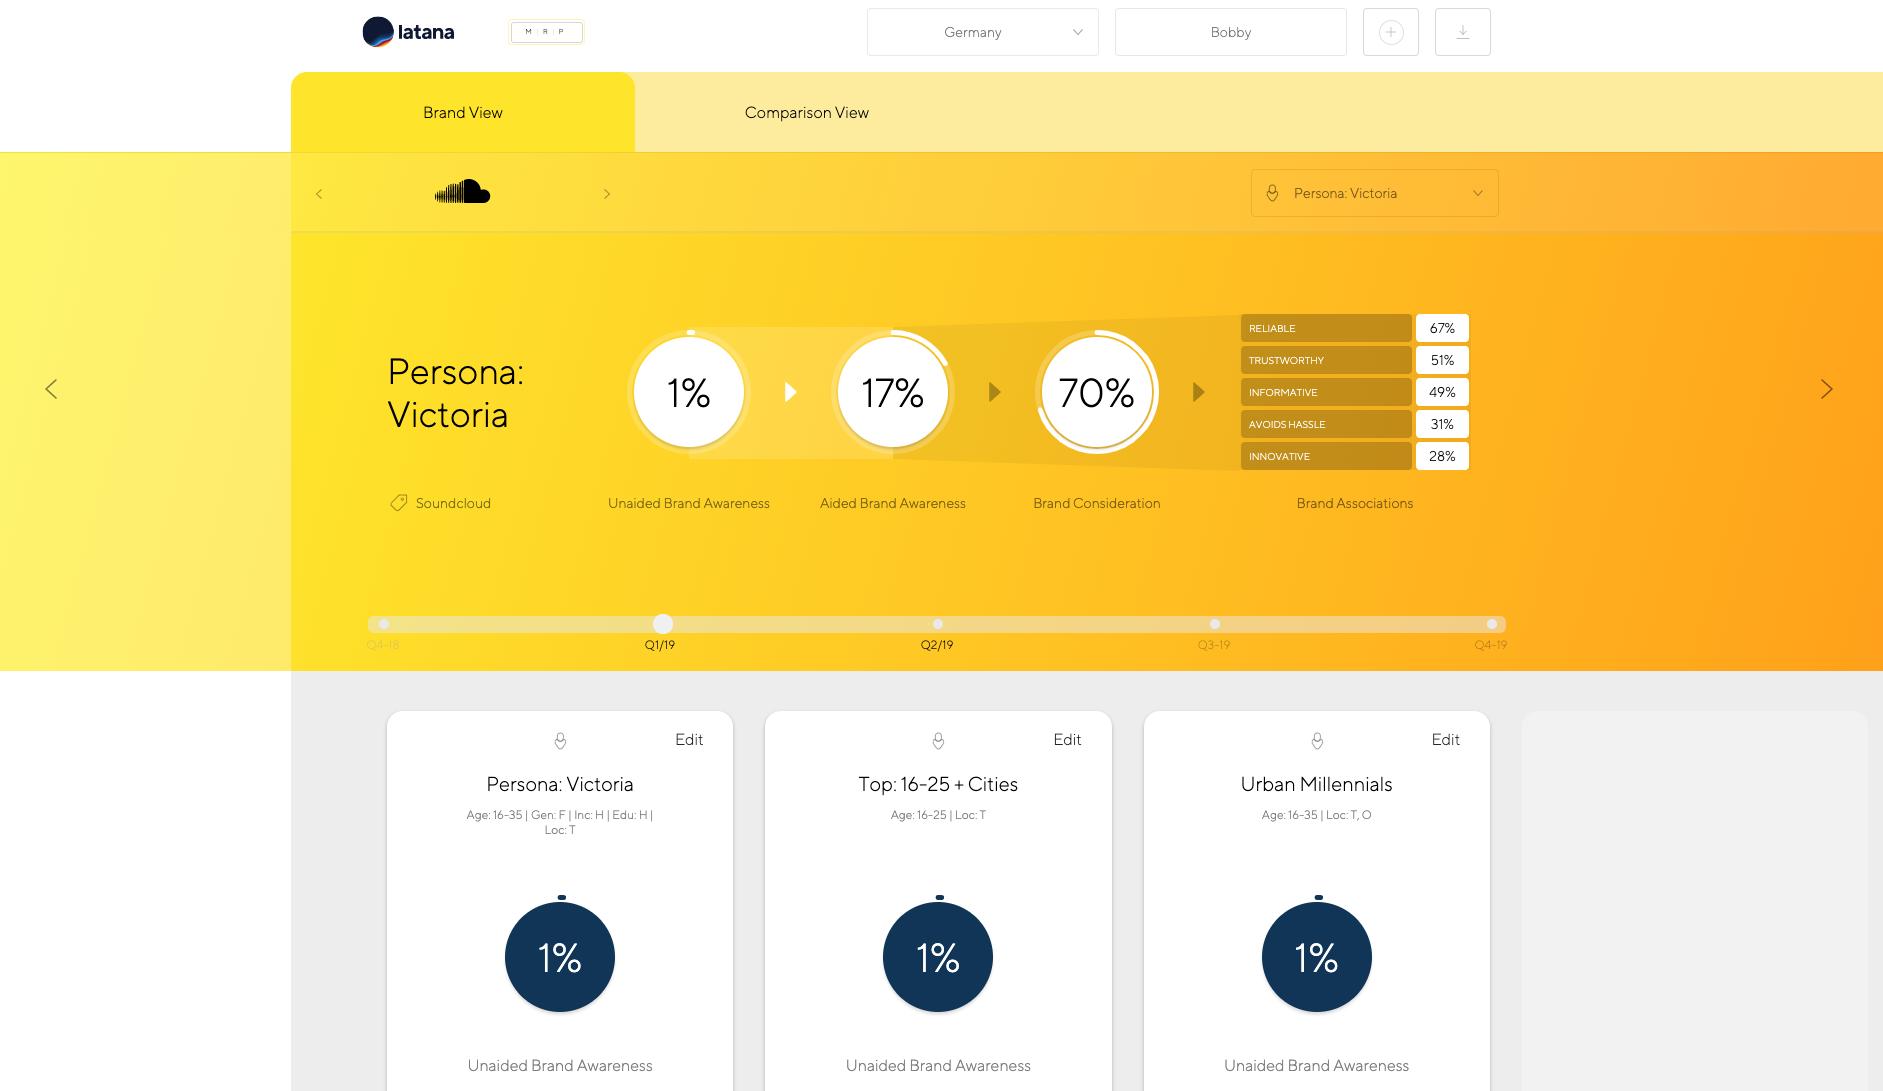 Latana brand tracking software brand view screen